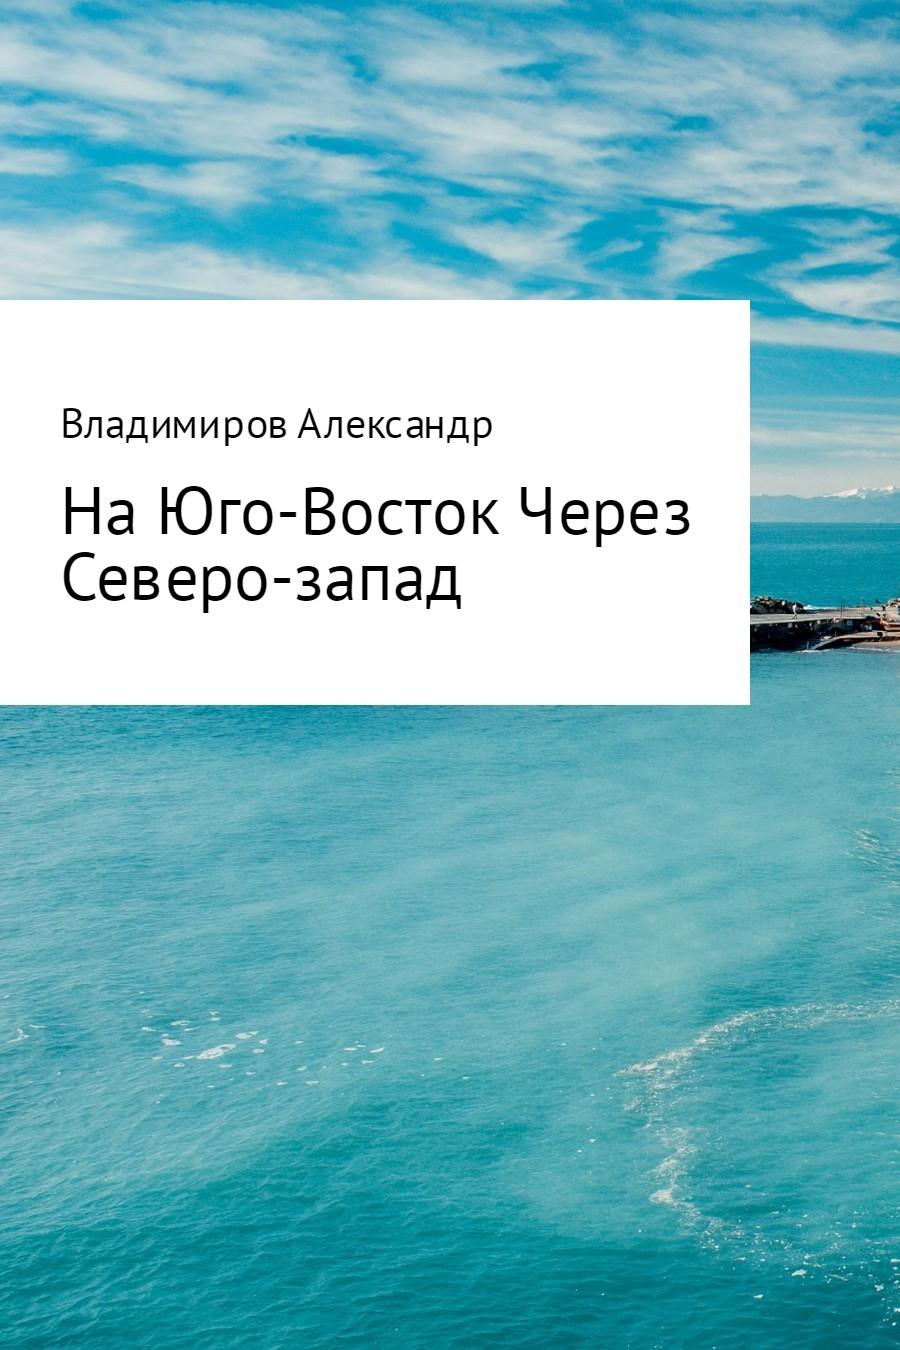 Александр Александрович Владимиров бесплатно